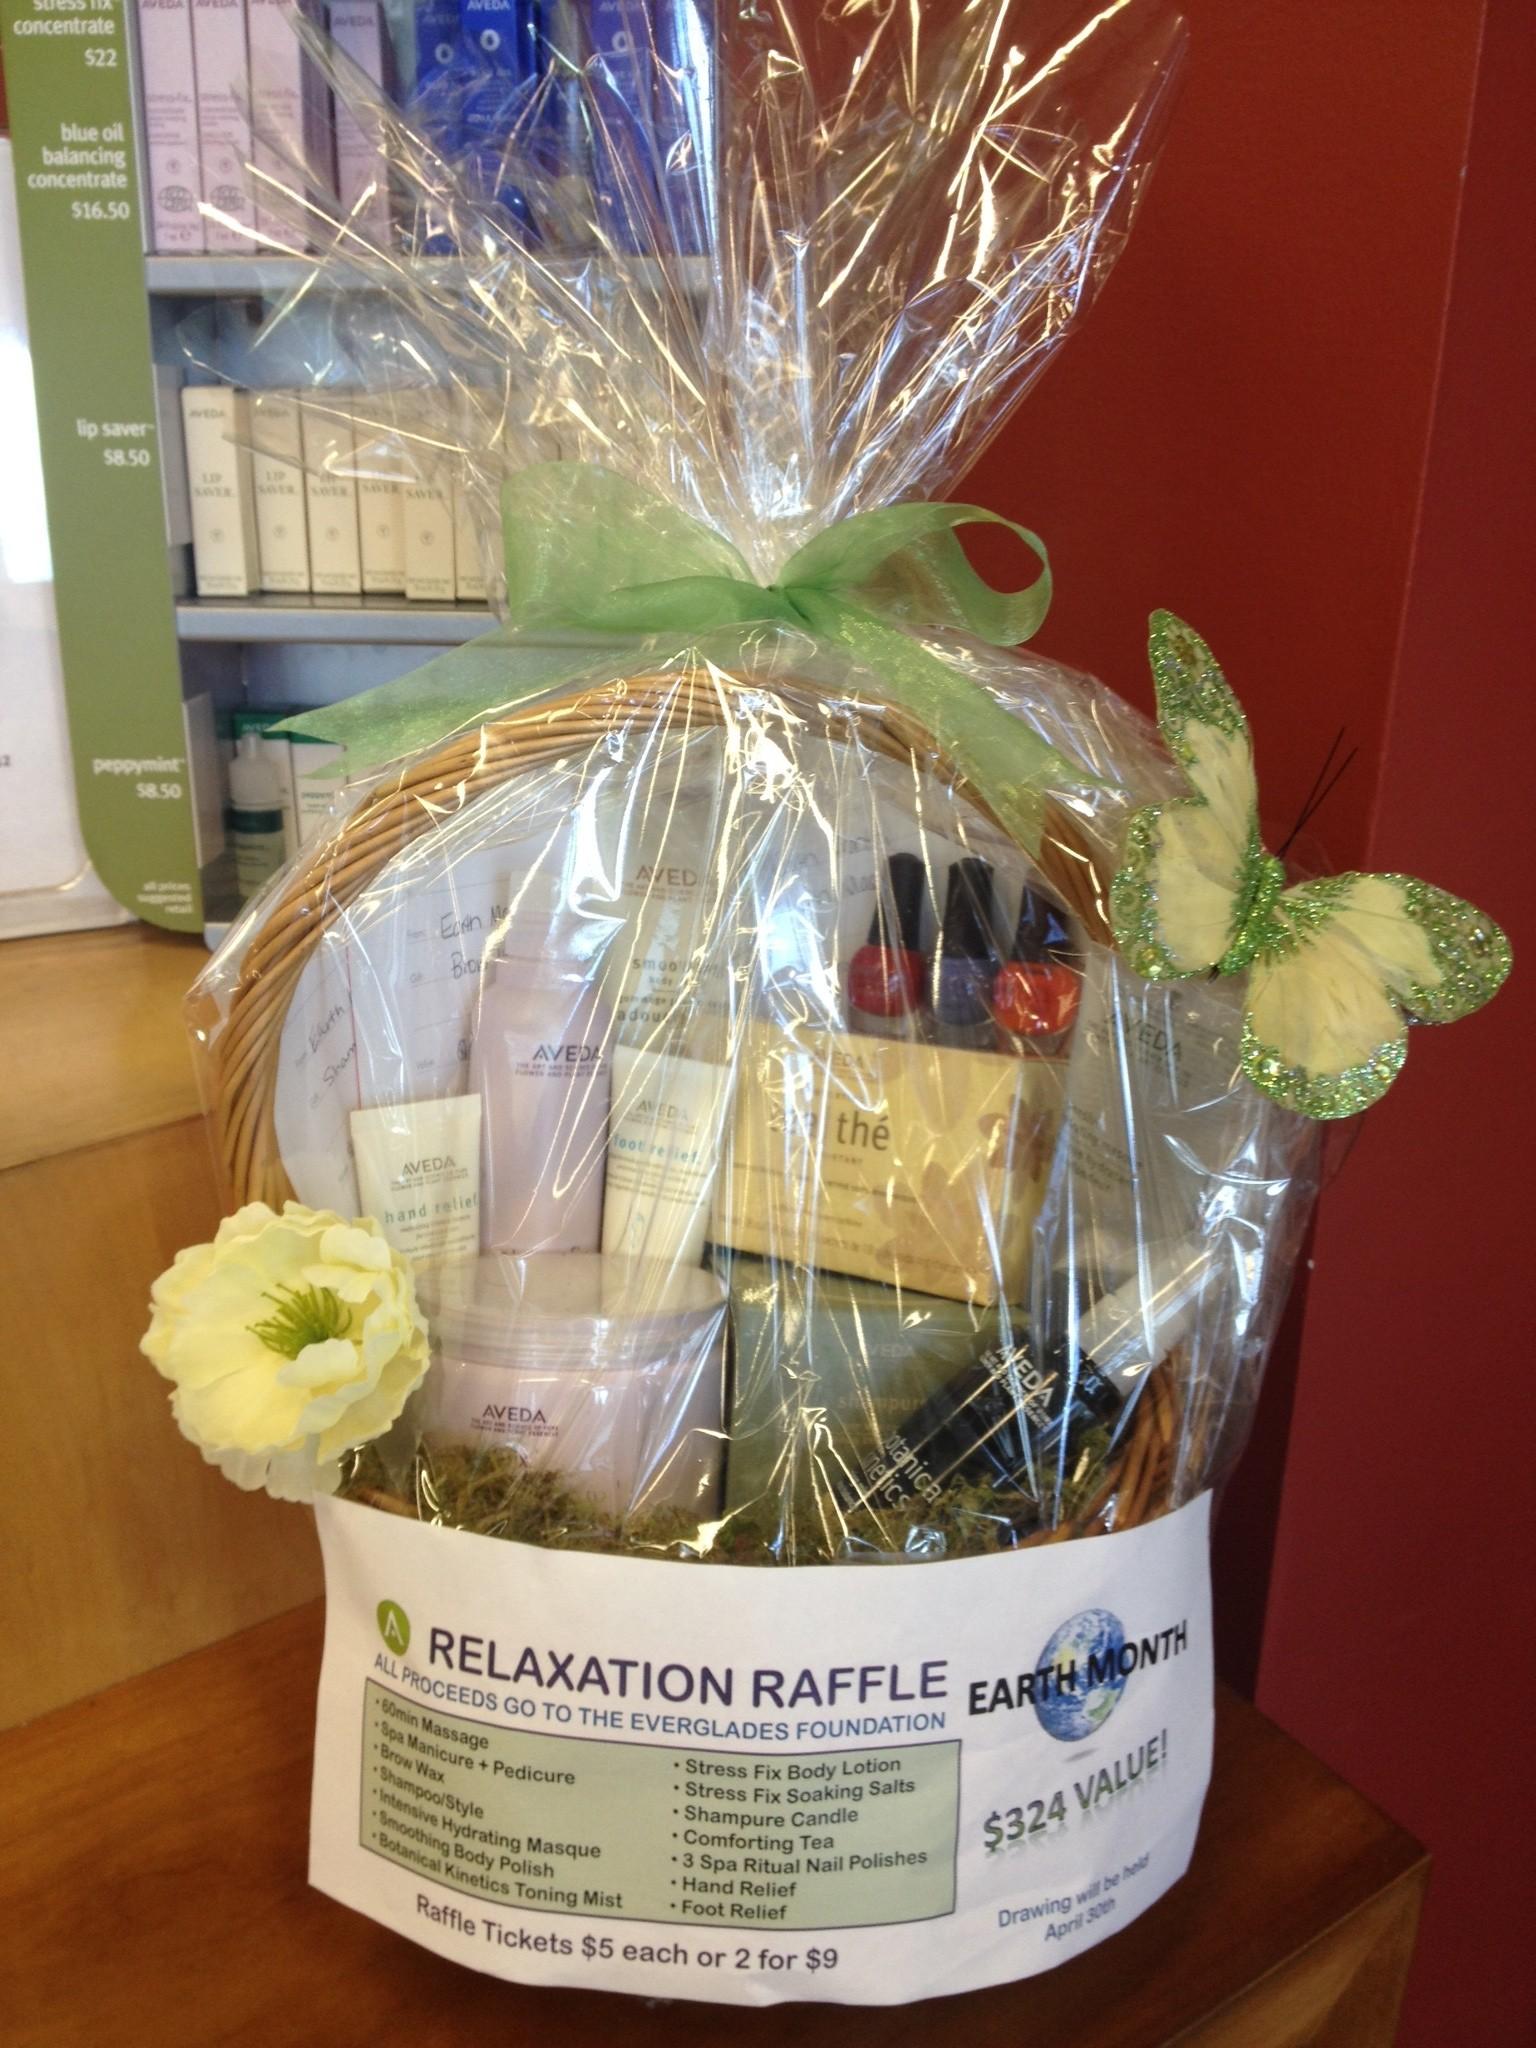 beauty school raffle basket for earth month fundraiser